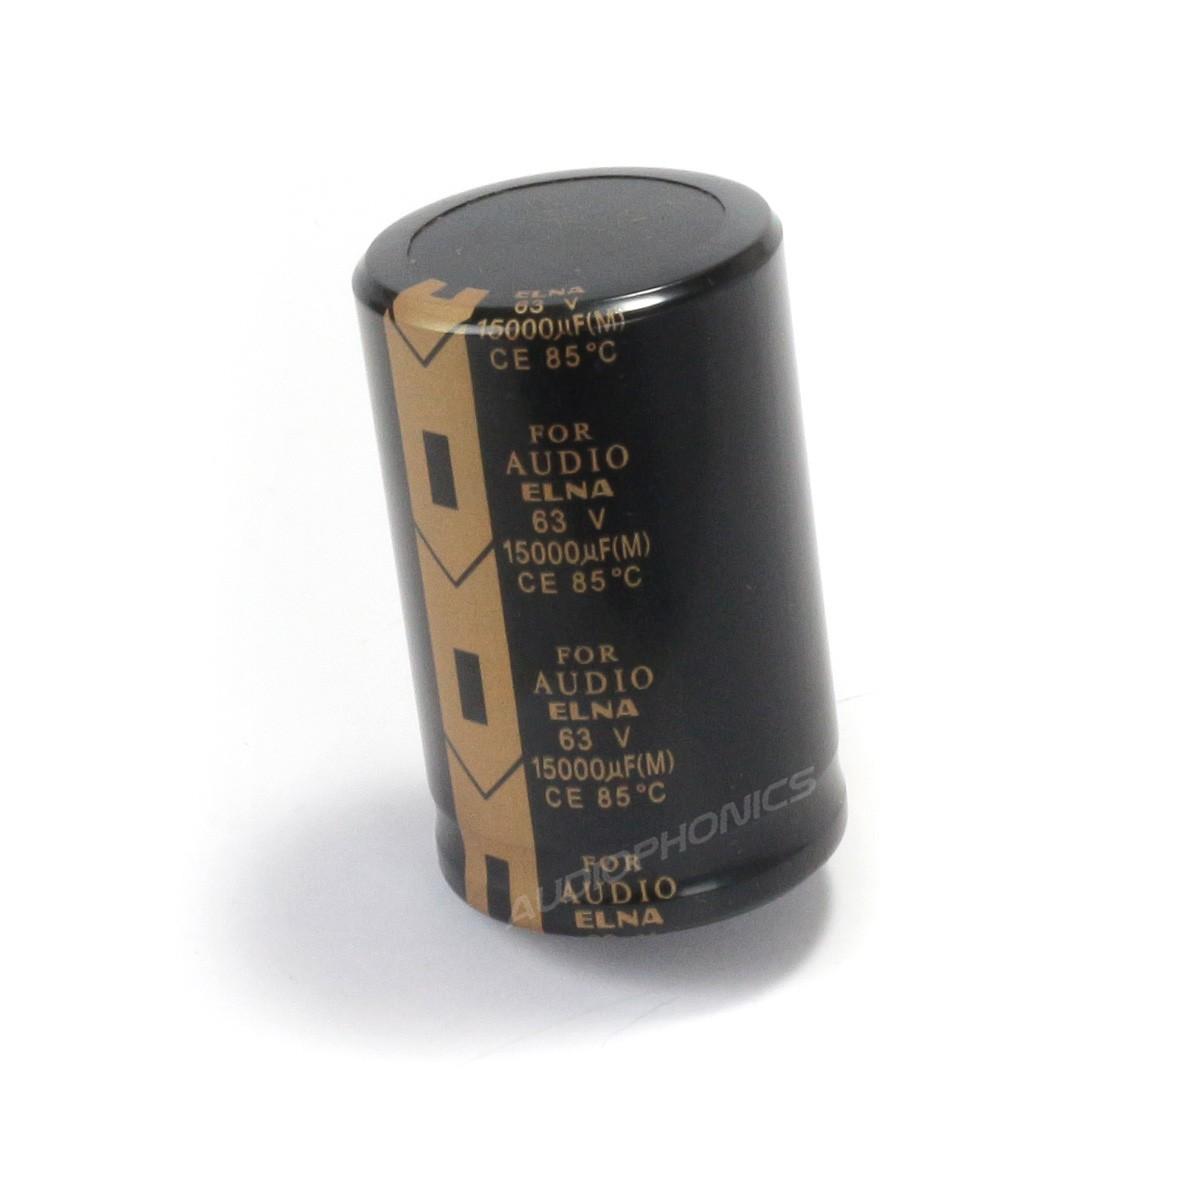 ELNA High Quality Electrolytic Capacitor 63V 15000µF